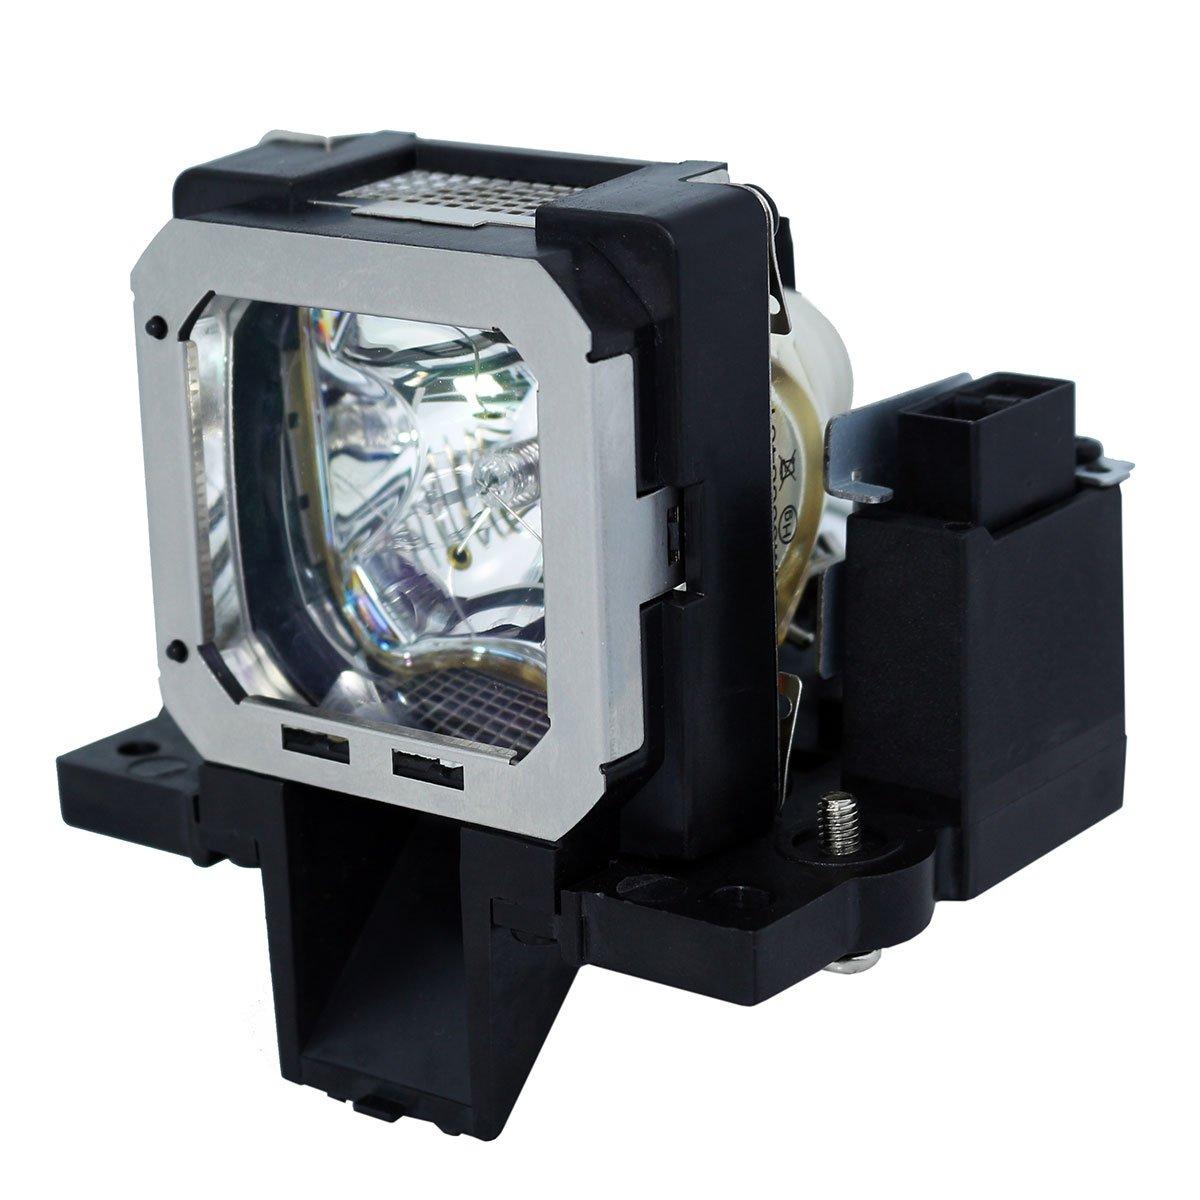 SpArc OEMプロジェクター交換用ランプ 囲い/電球付き JVC DLA-X3用 Platinum (Brighter/Durable) Platinum (Brighter/Durable) Lamp with Housing B07MPSBG3L